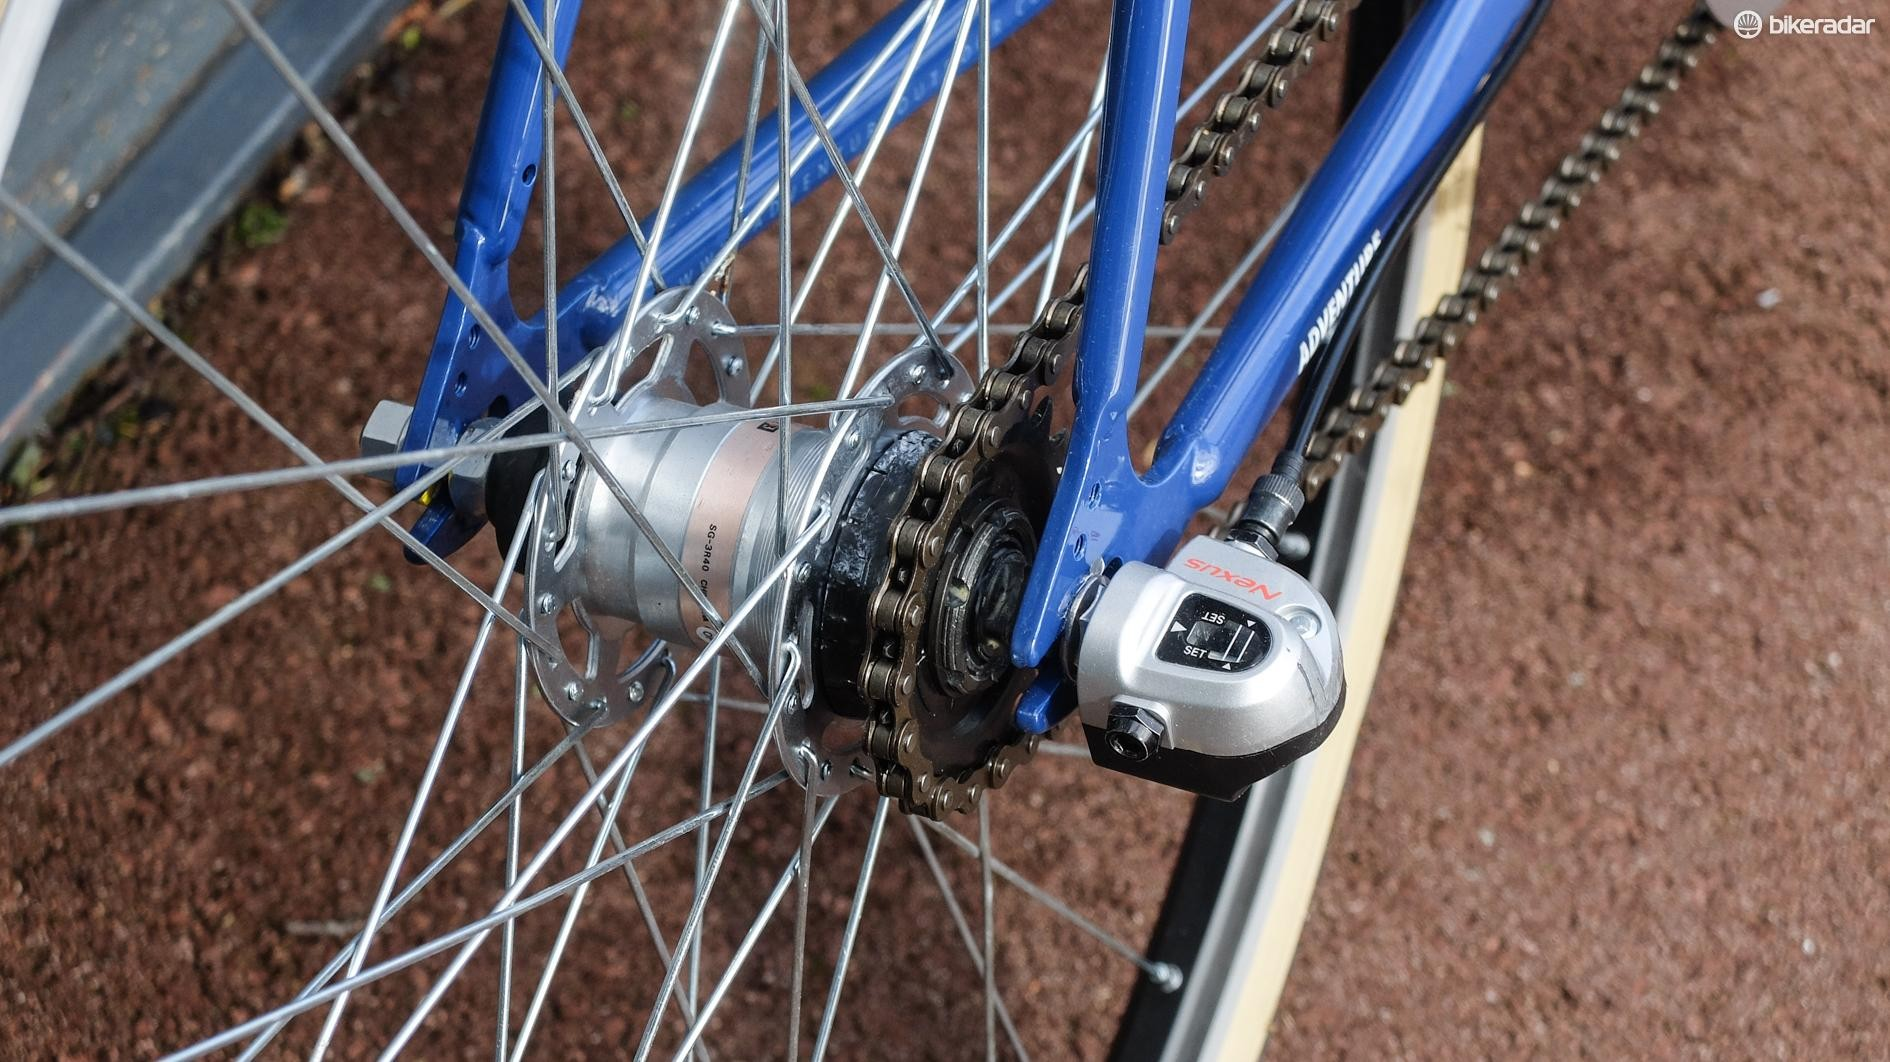 The bike is built around a three-speed Nexus hub